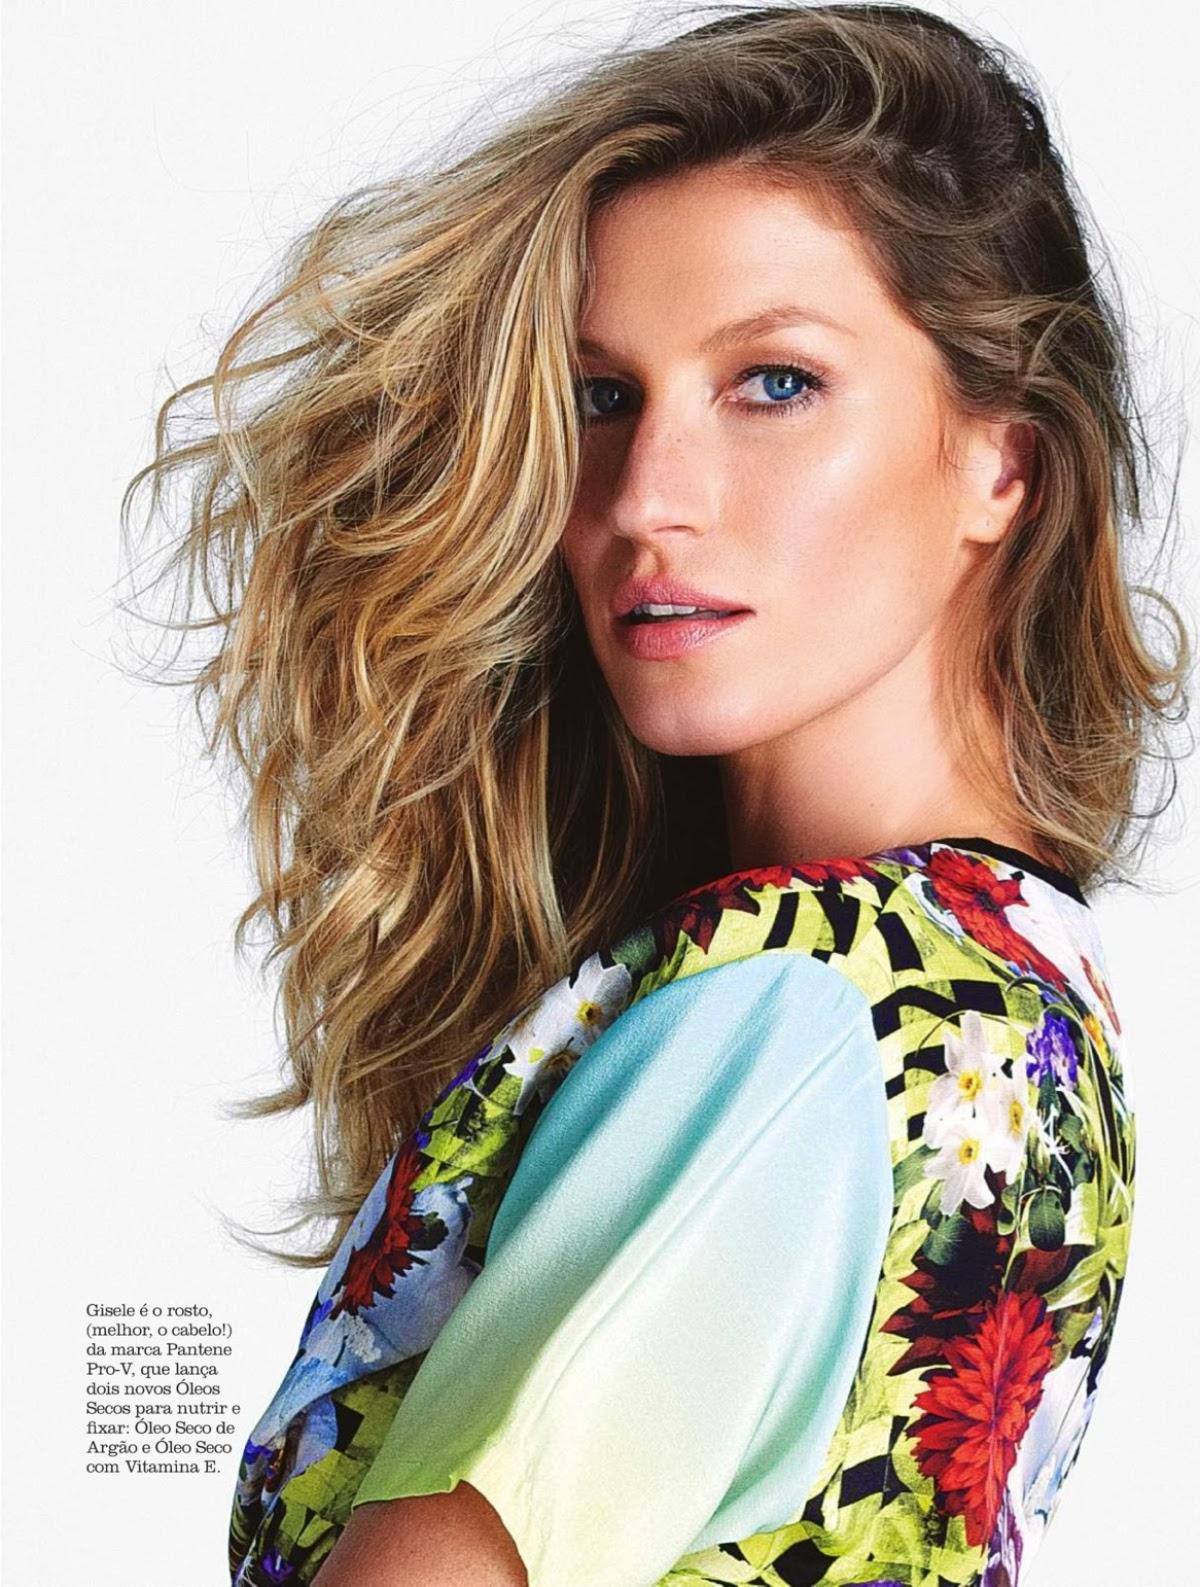 Gisele Bundchen For Elle Magazine, Argentina, July 2014 ... Gisele Bundchen Wiki